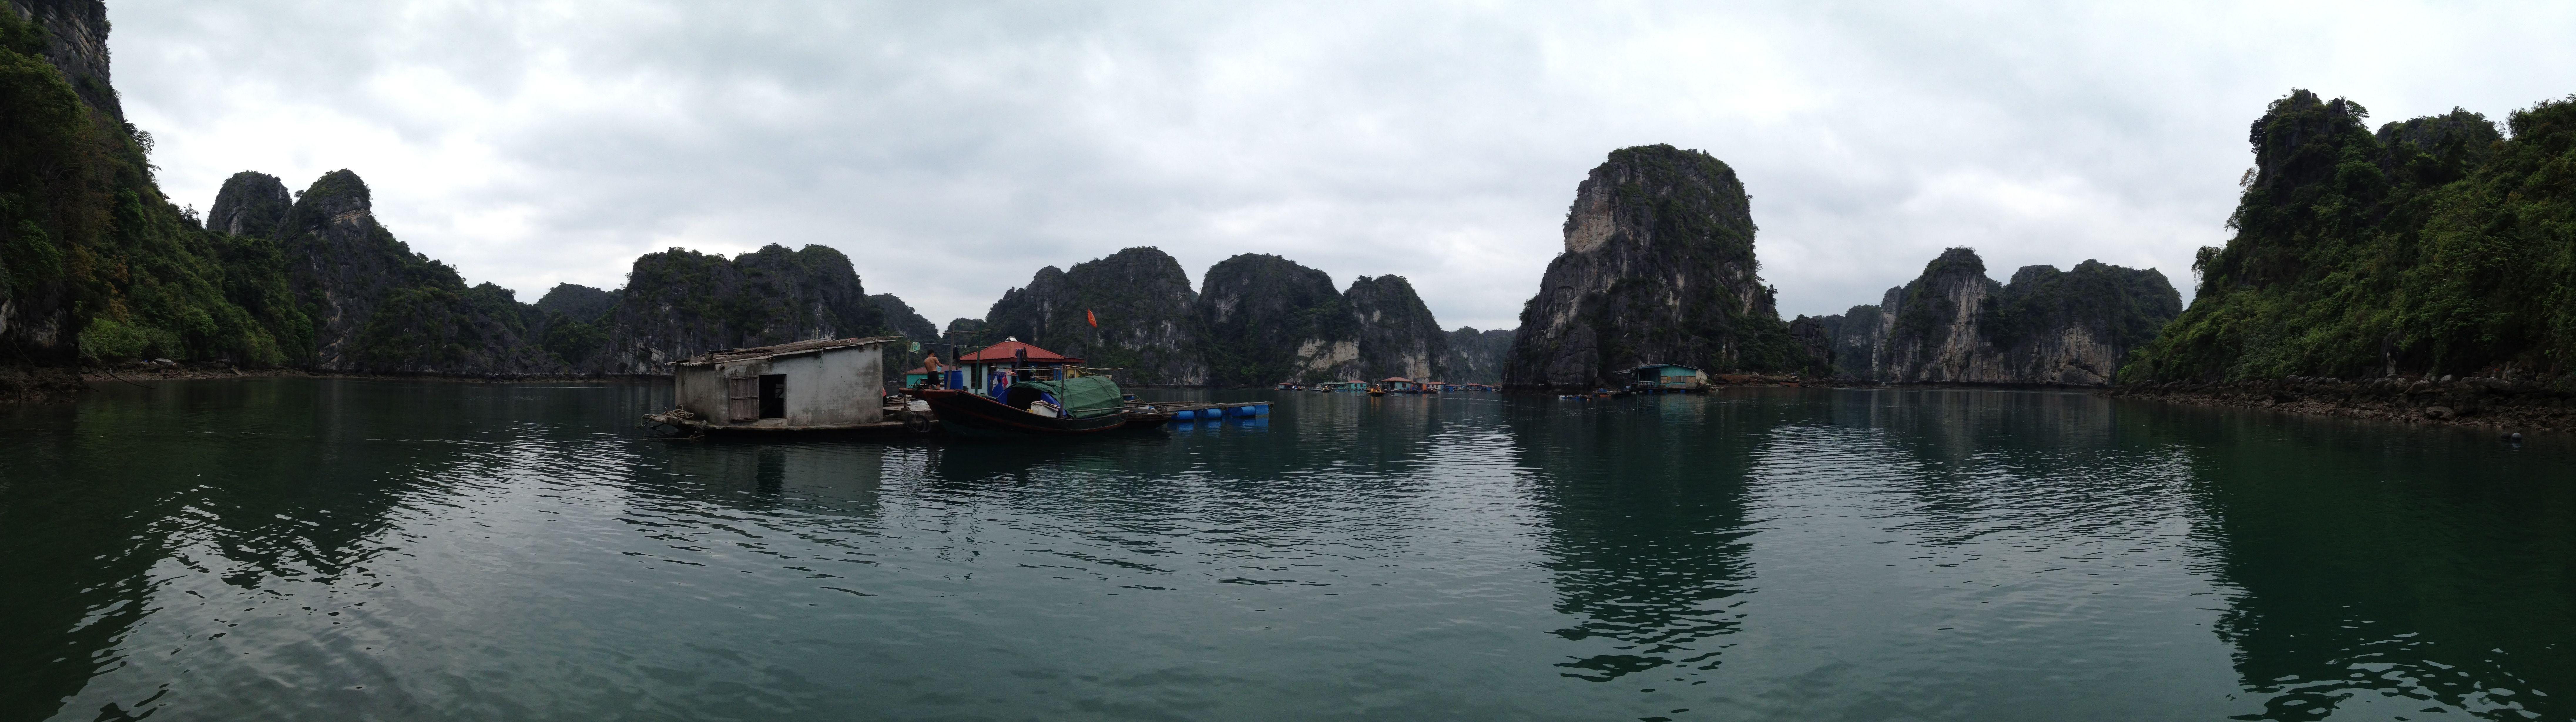 Vịnh Hạ Long Ha Long Bay Places To Visit Ha Long Ha Long Bay